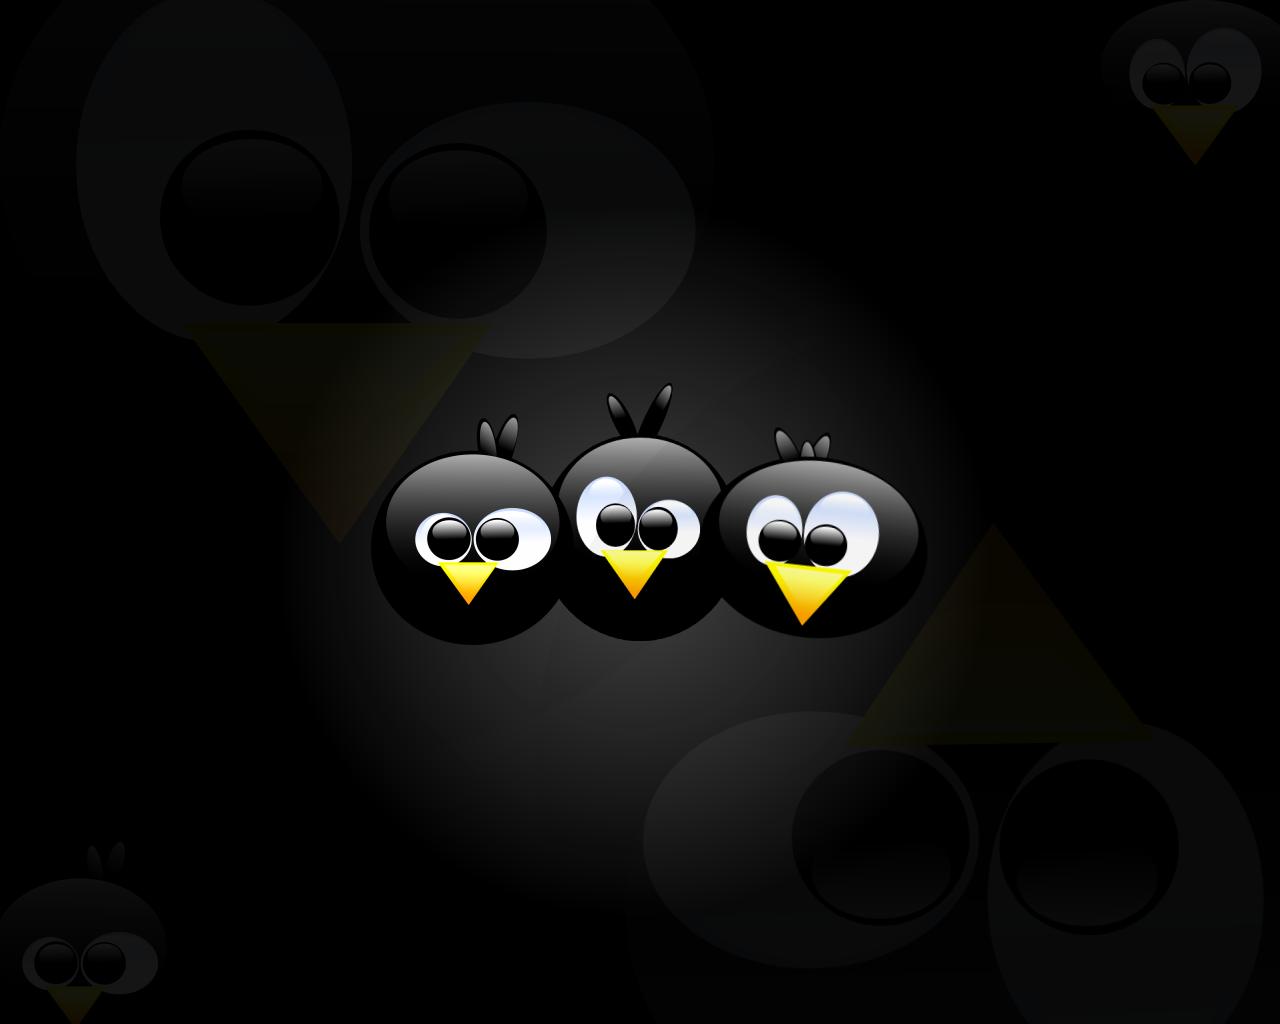 http://1.bp.blogspot.com/--4HIovec-Dk/TrDPtBbUKwI/AAAAAAAAAew/qDhiQYX_qLw/s1600/linux-wallpaper-1.png